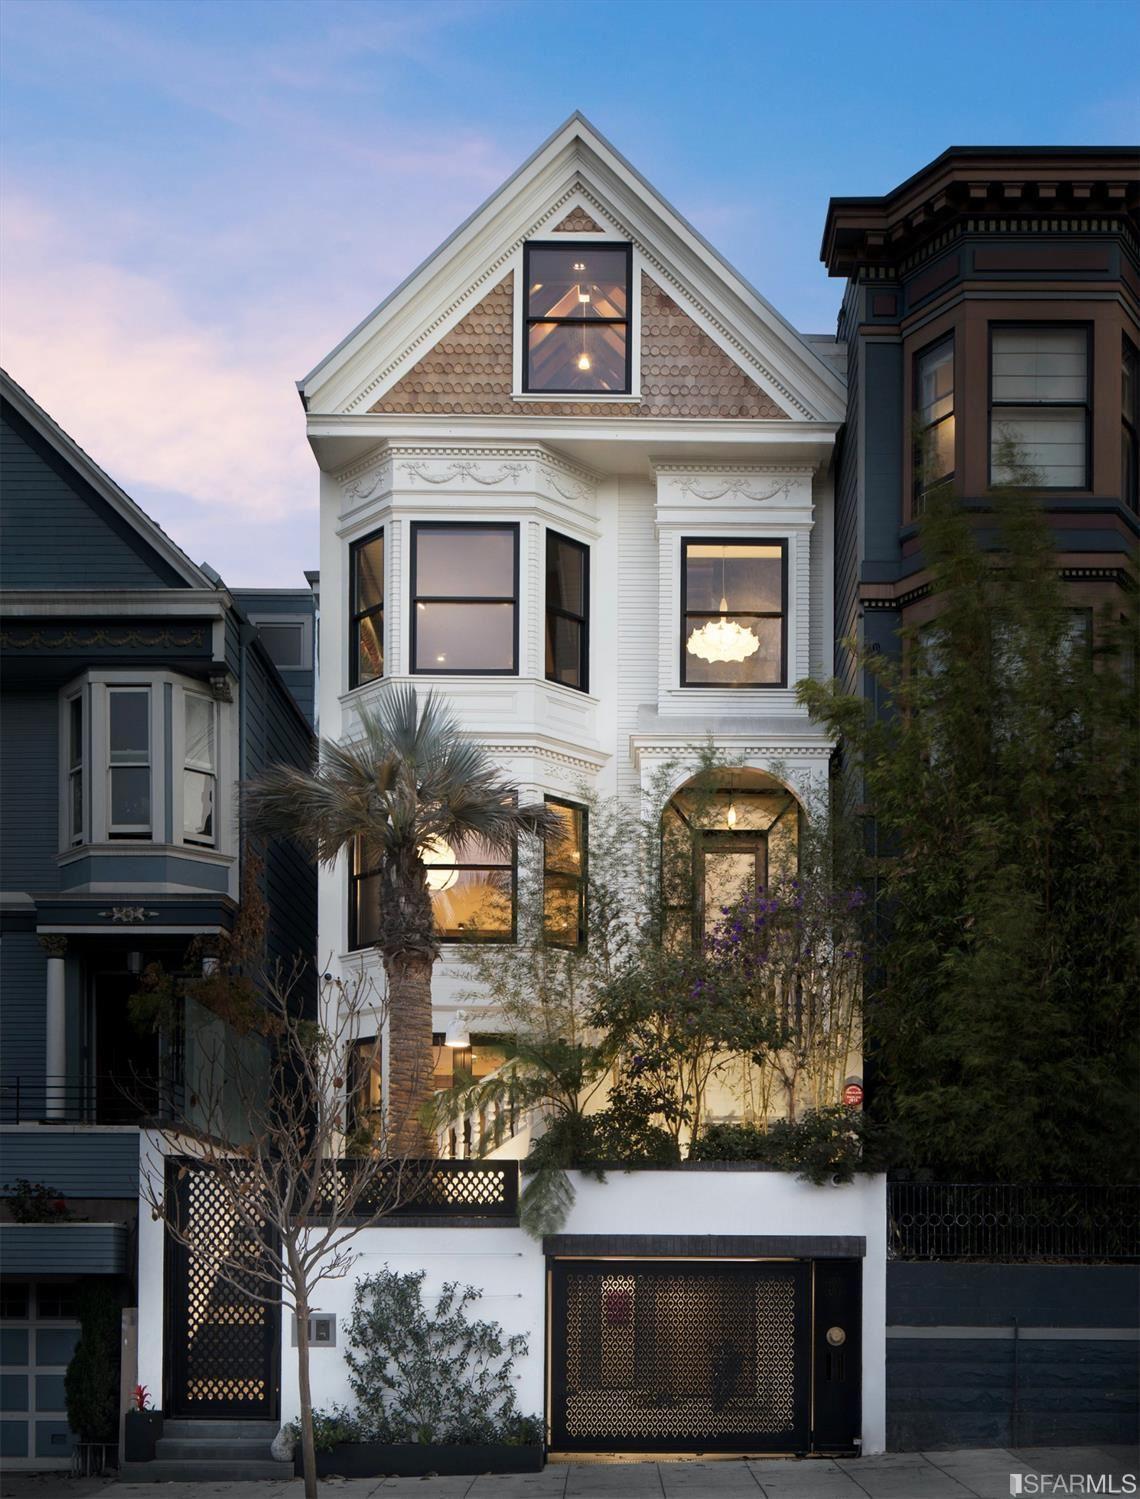 3847 3849 18th Street #2 Units, San Francisco, CA 94114 - #: 494702